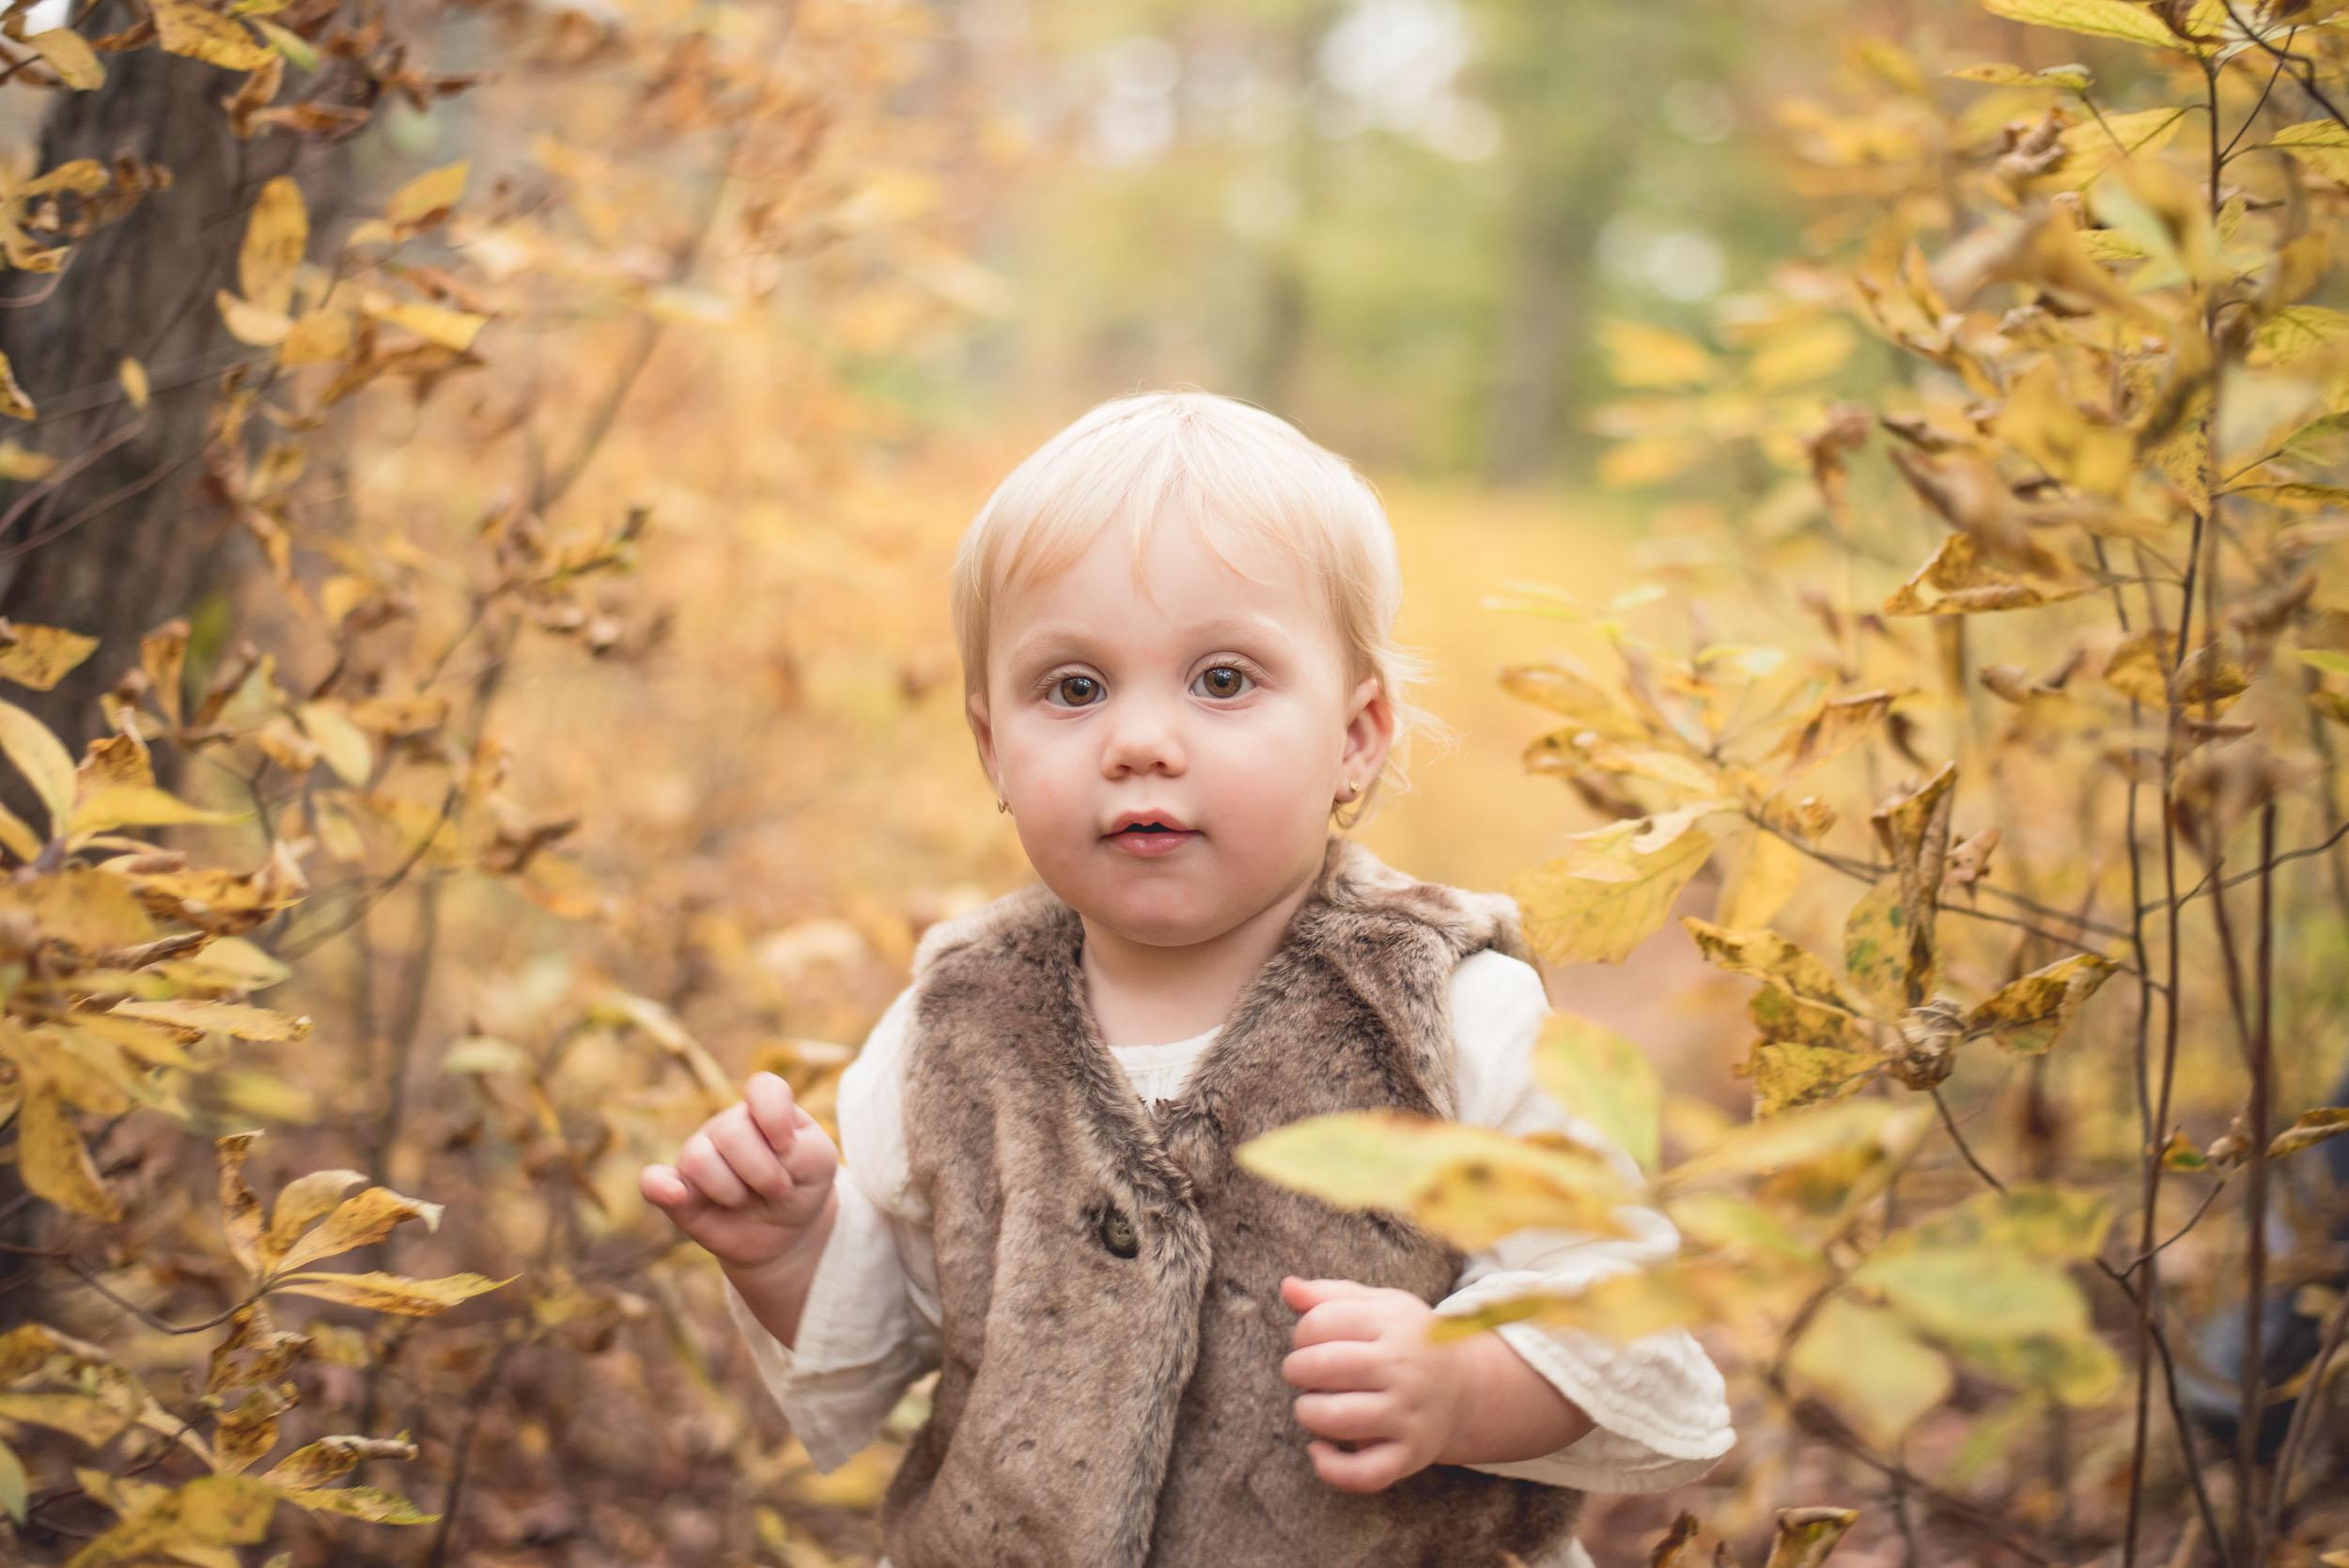 Ramsey_Child_Family_Photo_Session_Maryland_Crofton_Gambrills(9of12).jpg